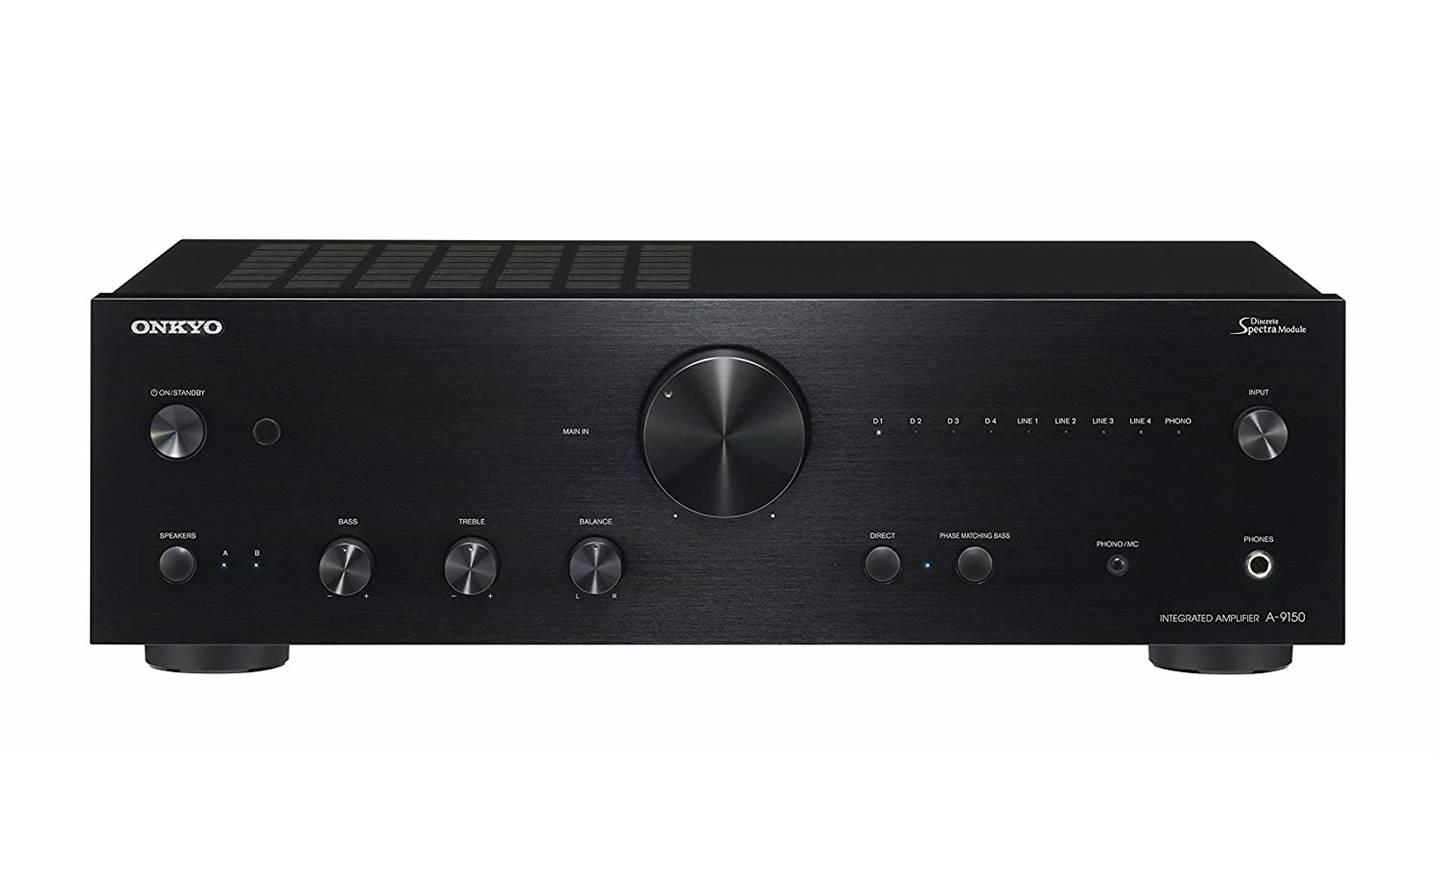 Onkyo A-9150 Stereo Amplifier